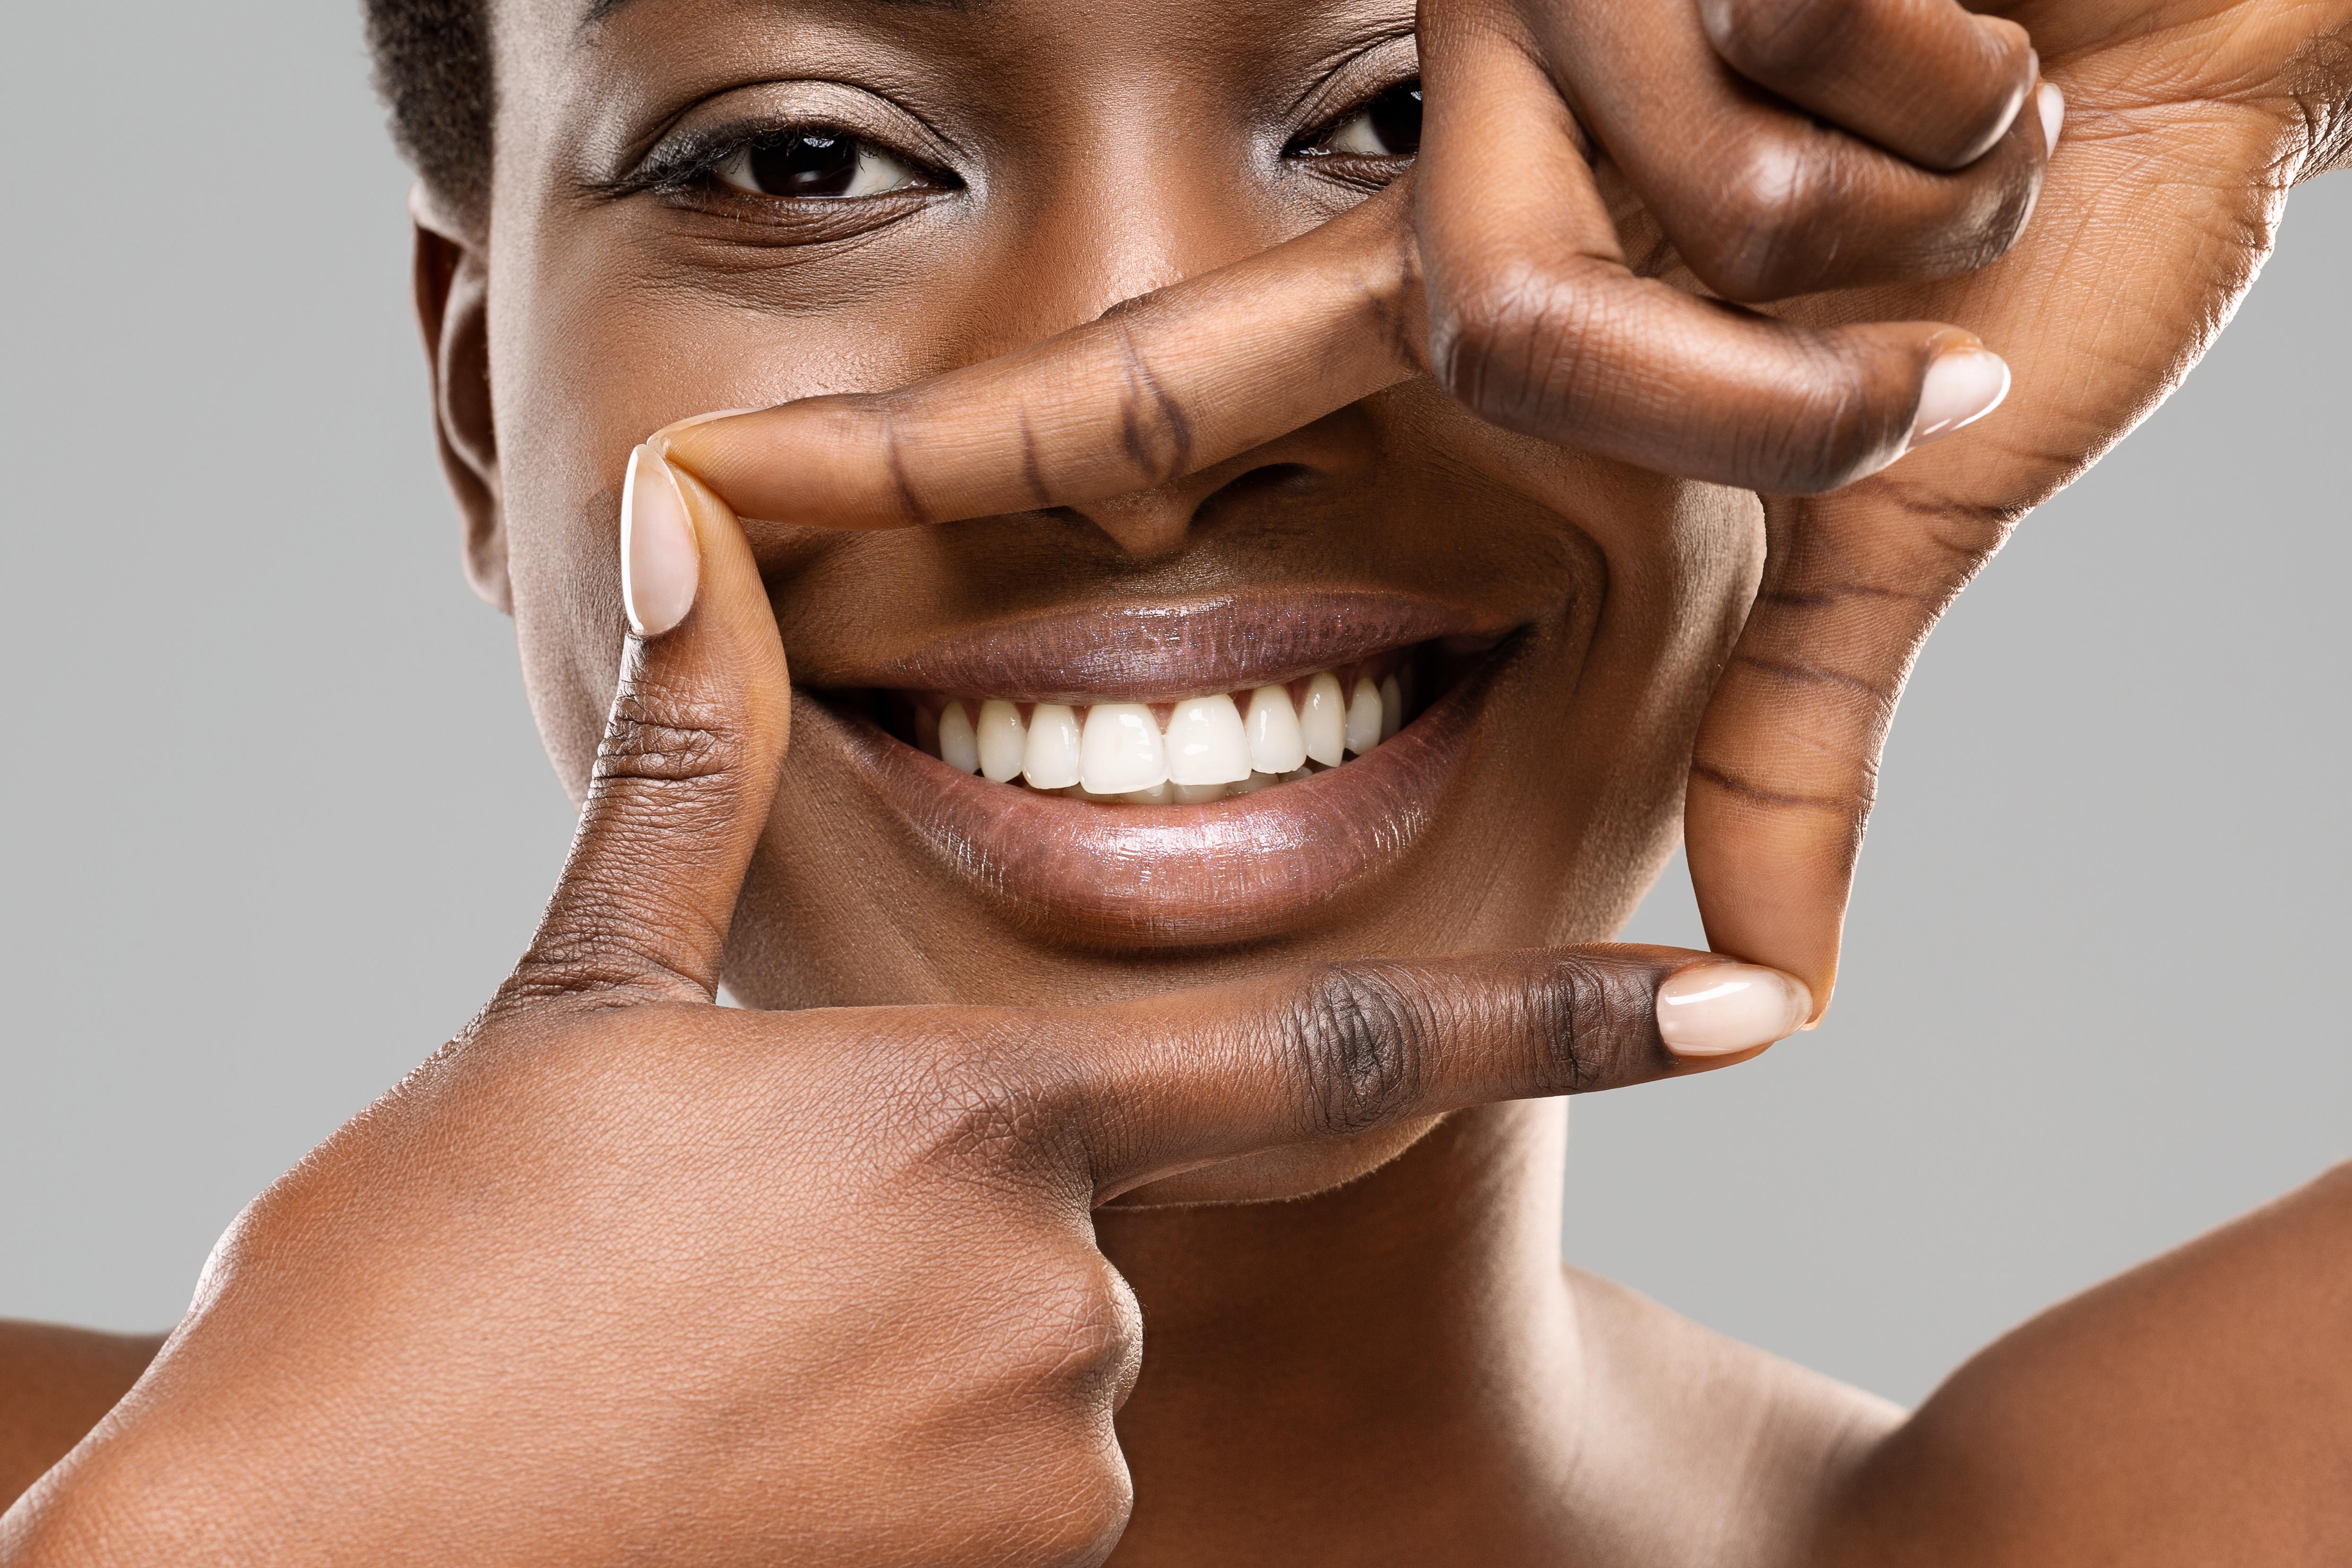 60 Min Teeth Whitening Session